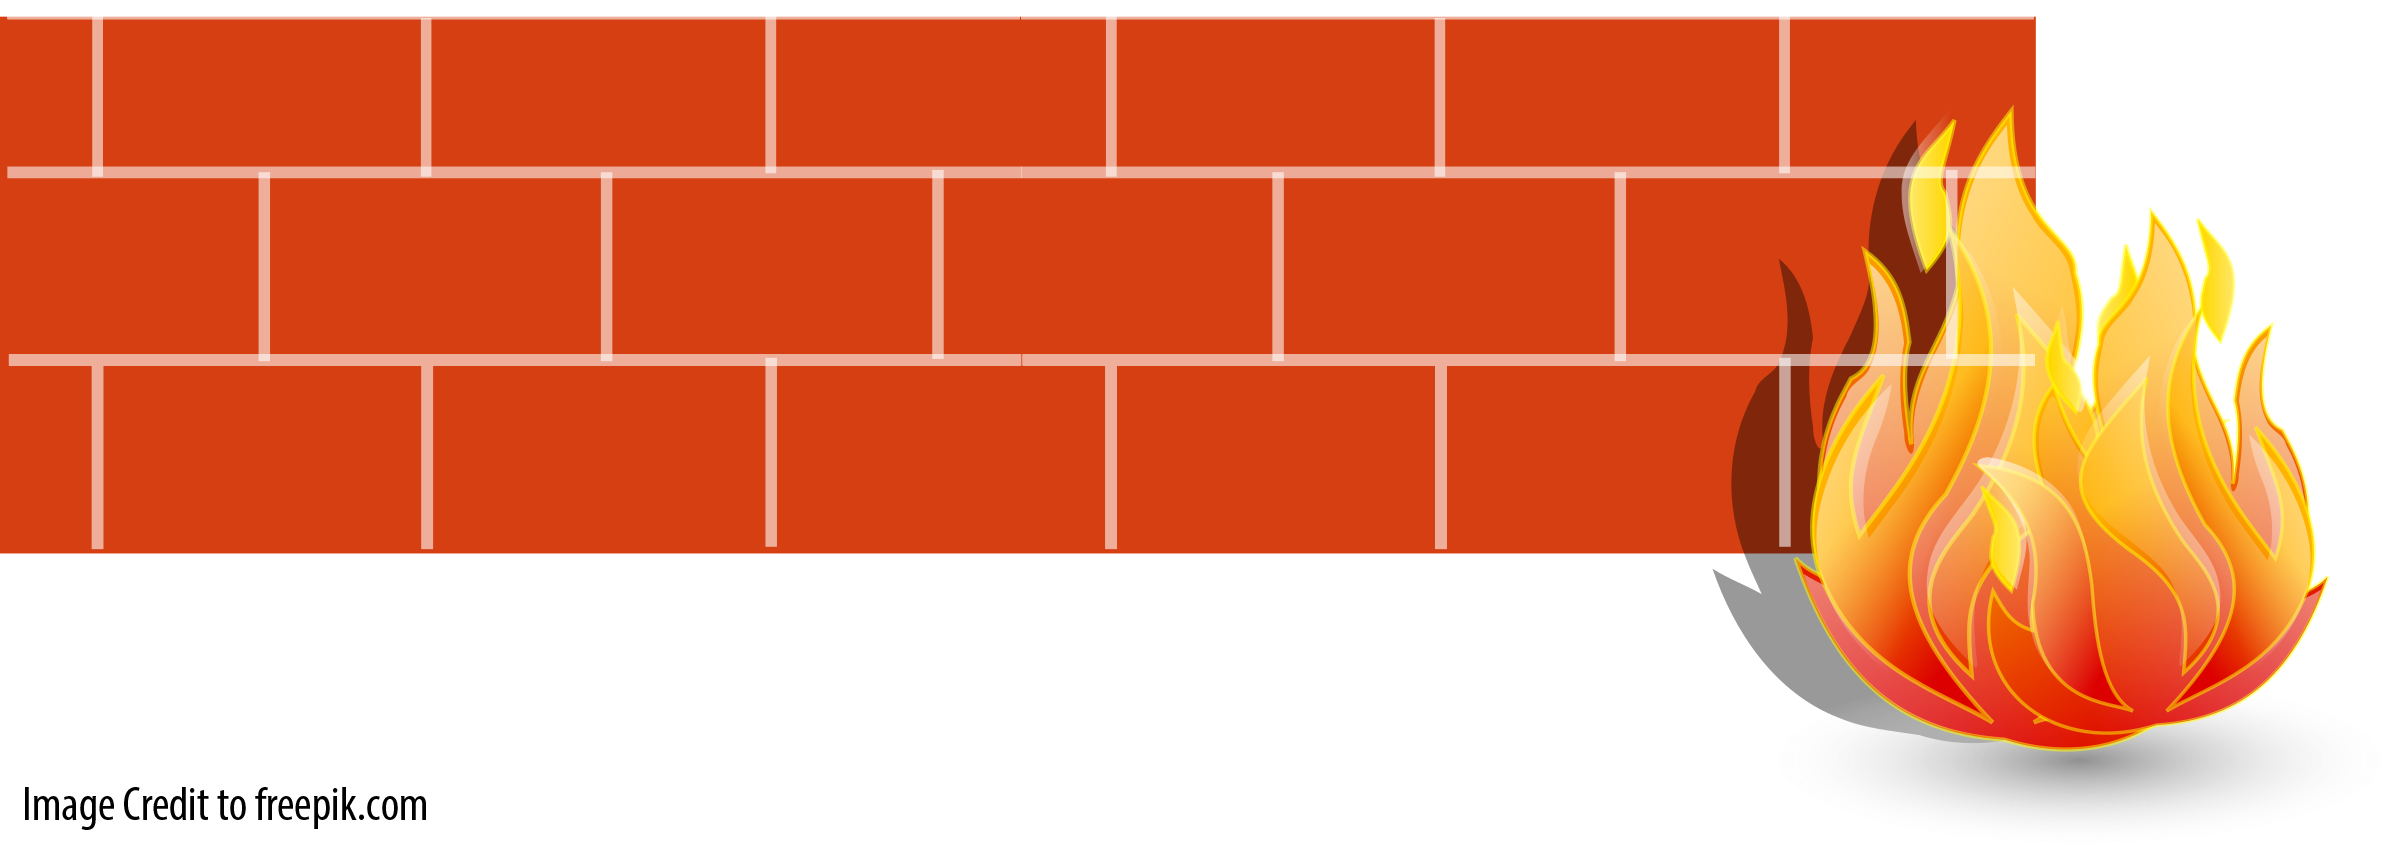 Microsoft Clipart Firewall.